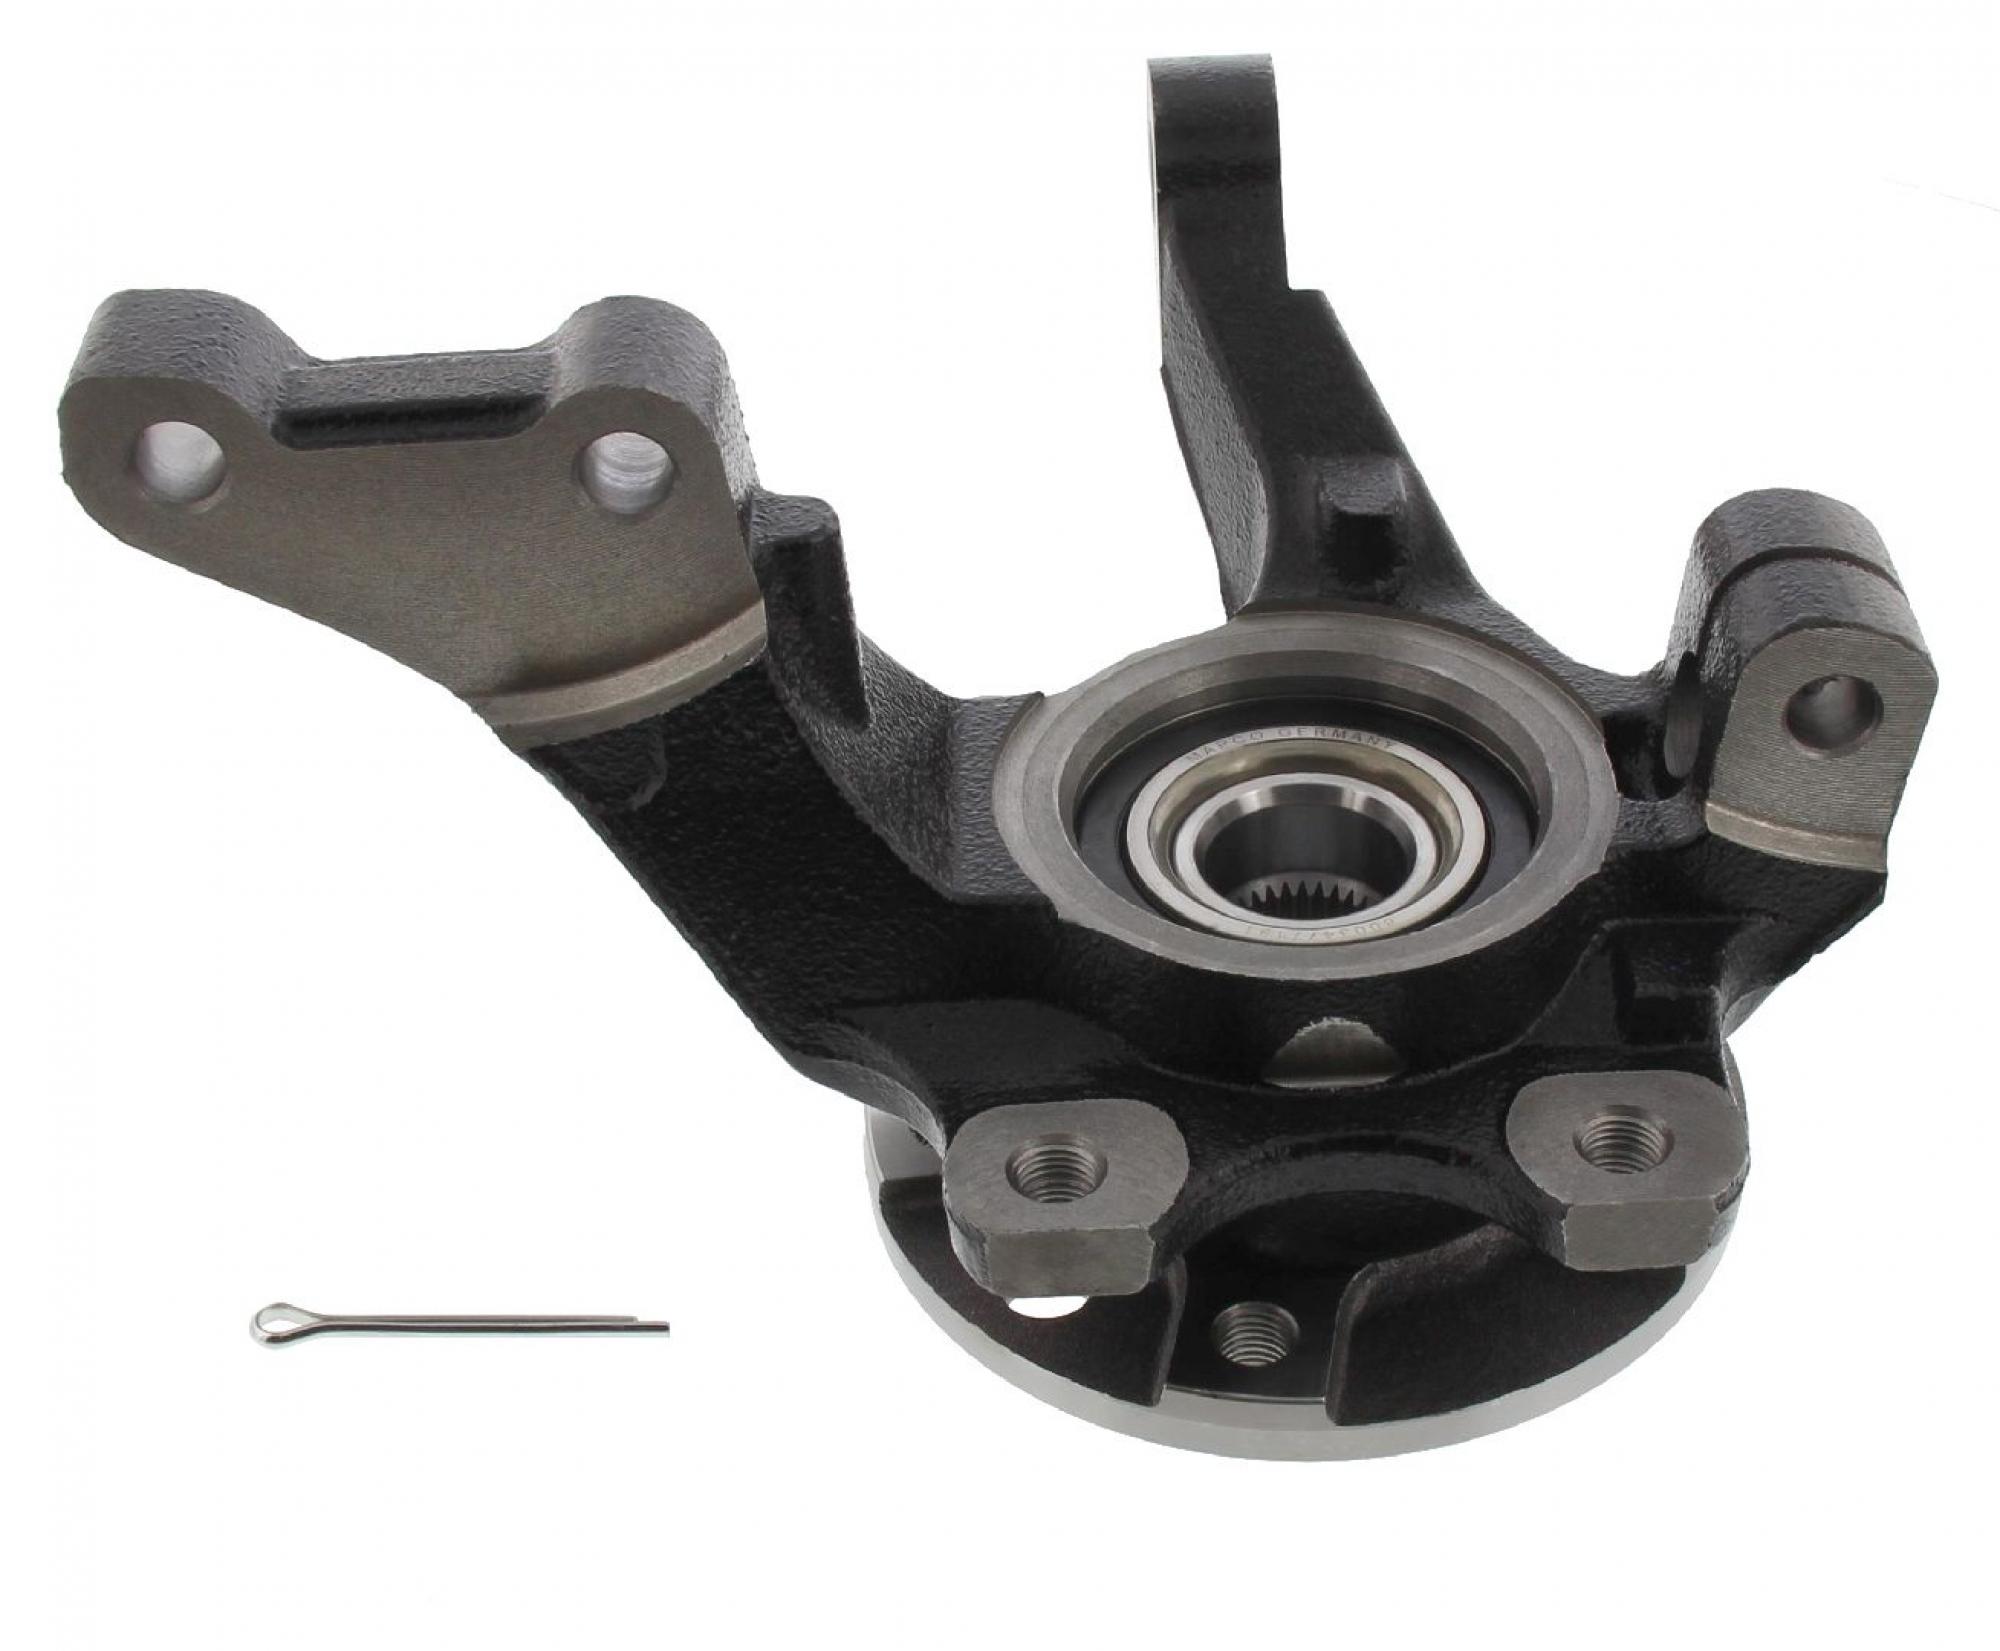 MAPCO 107703/4 Repair Kit, stub axle